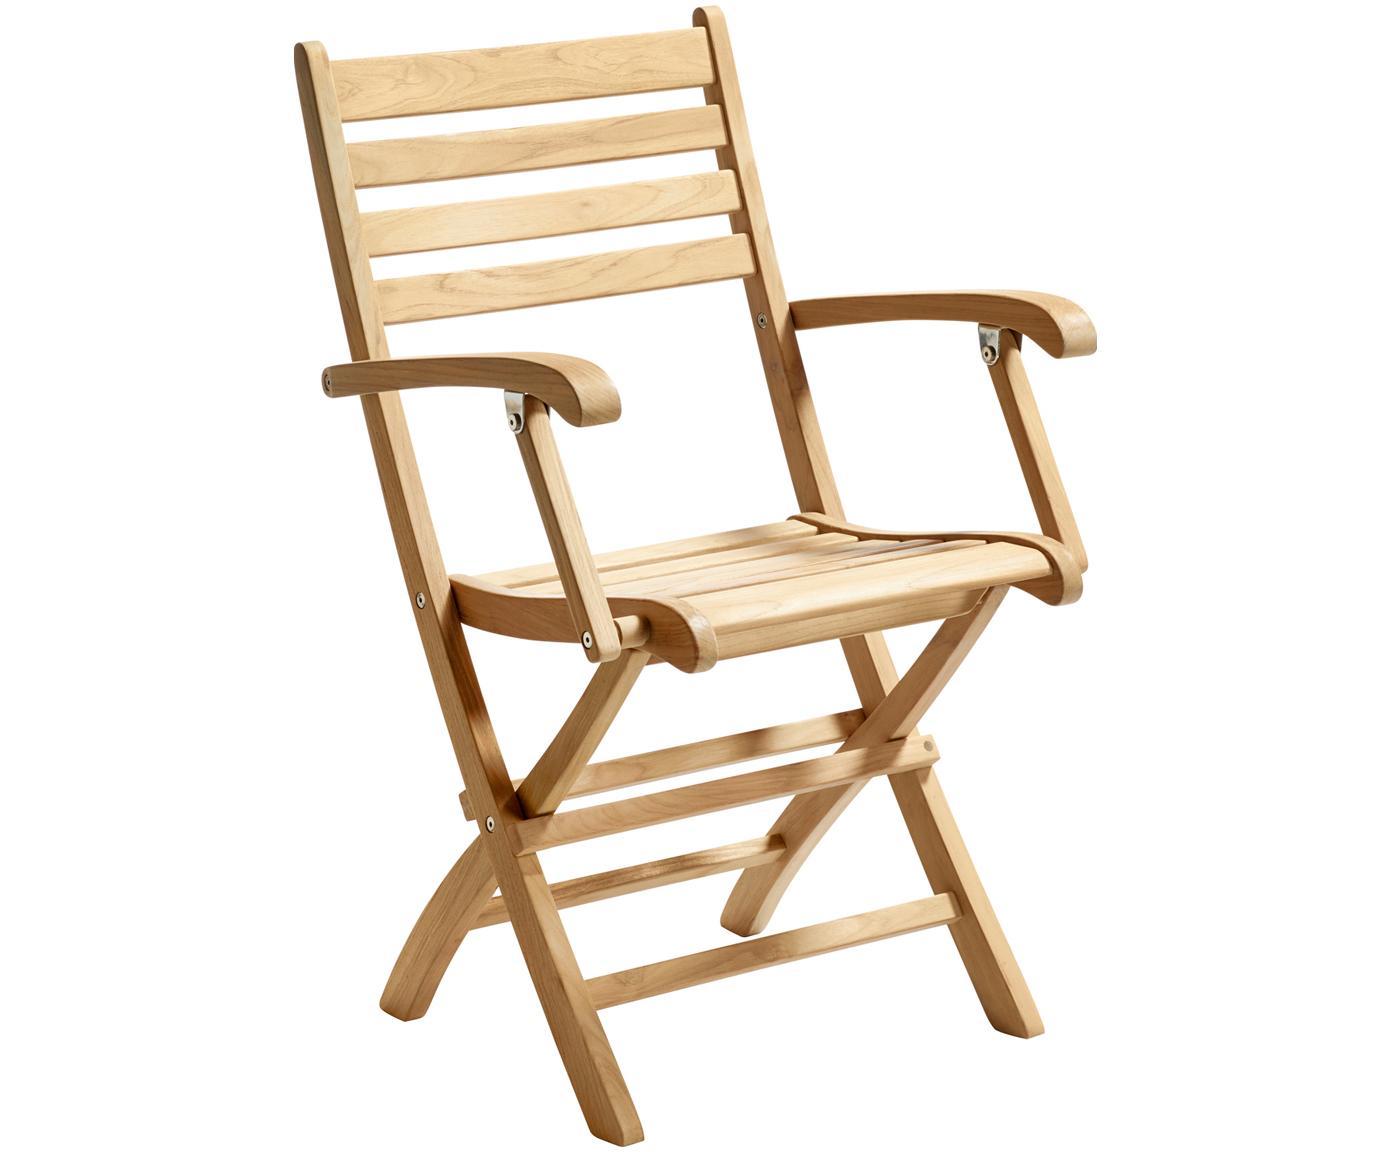 Sedia da giardino in legno York, Legno di teak, sabbiato Possiede certificato V-legal, Teak, Larg. 51 x Alt. 86 cm